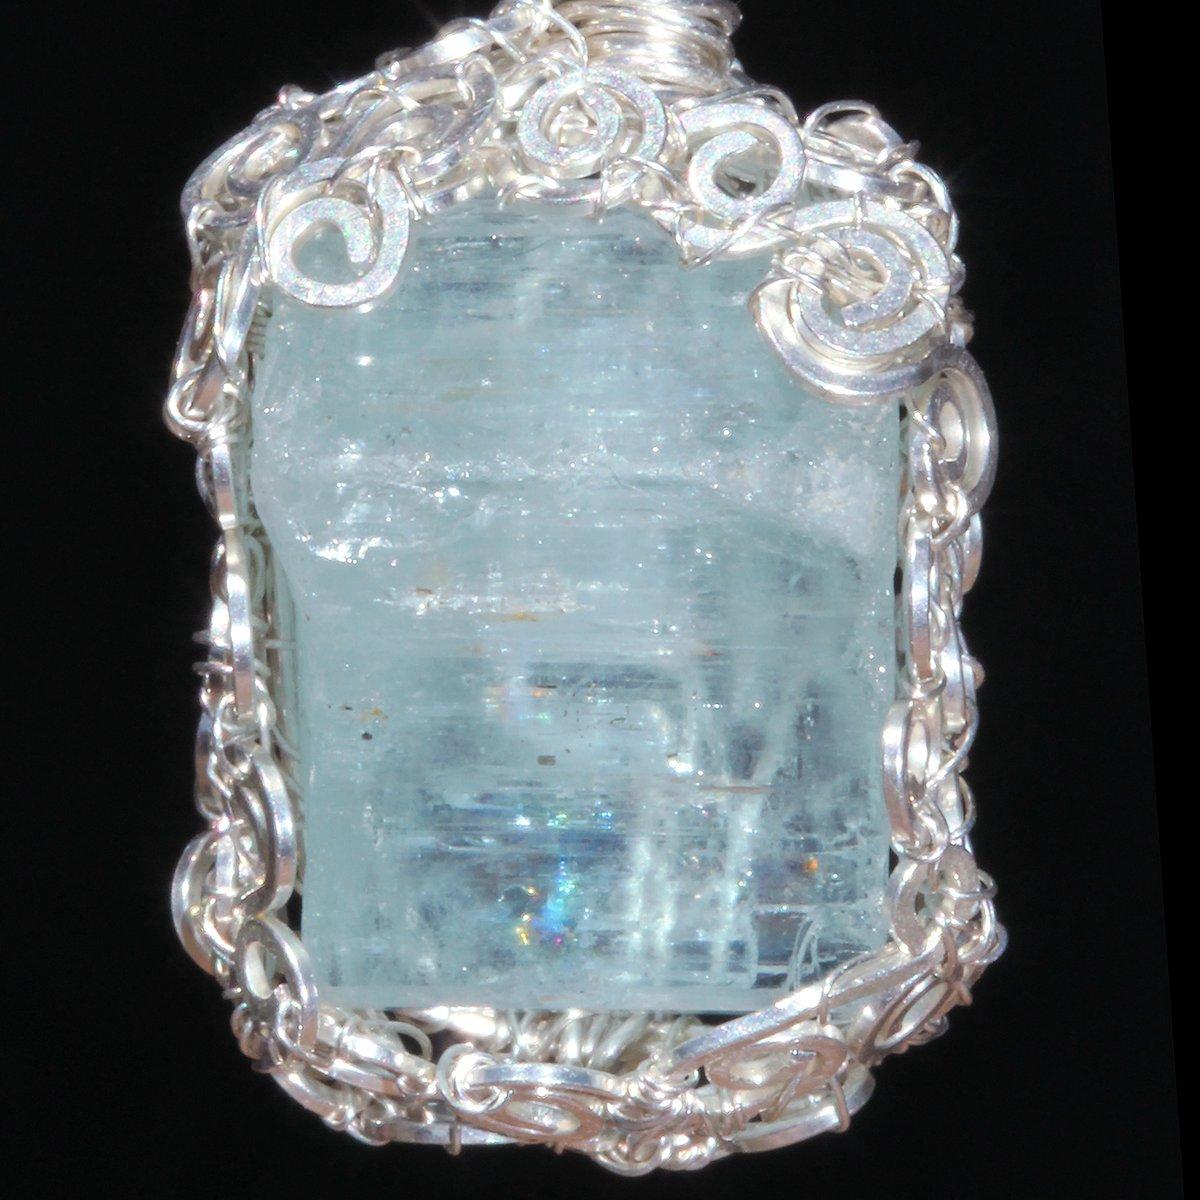 Rough Aquamarine Crystal Handmade Pendant